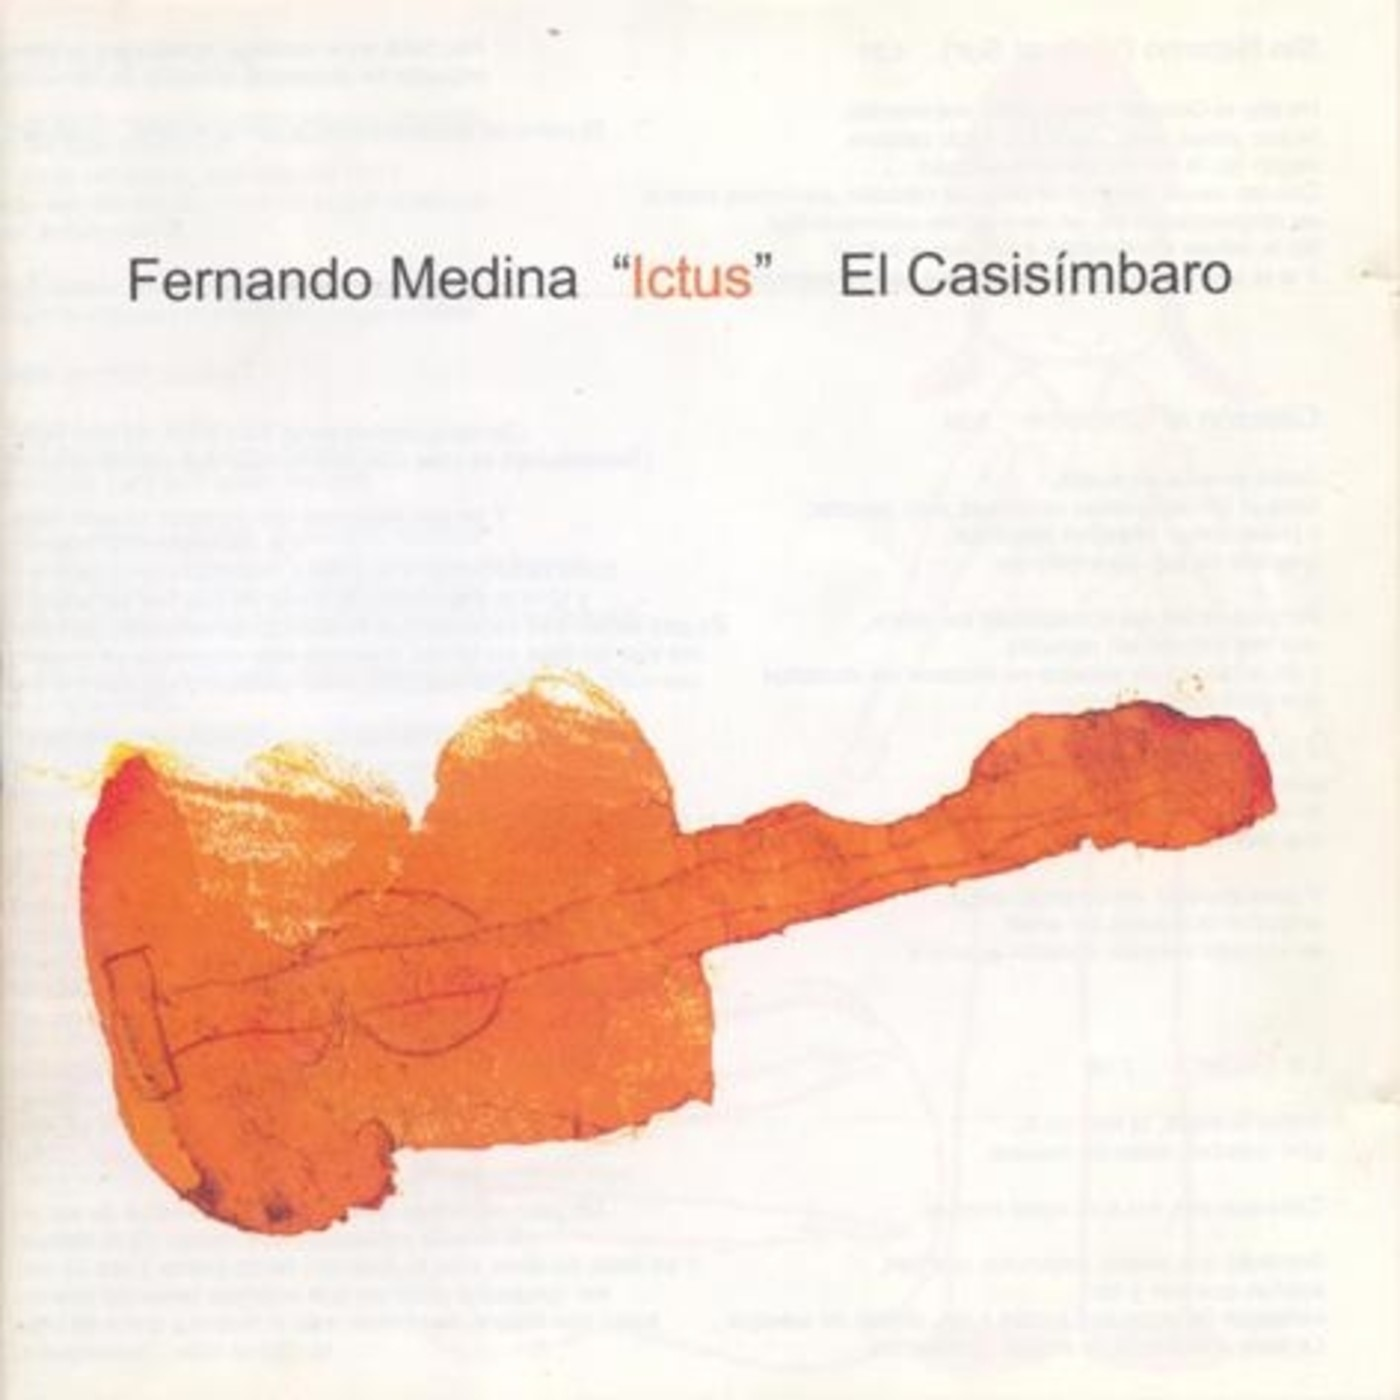 Fernando Medina Ictus El casisimbaro